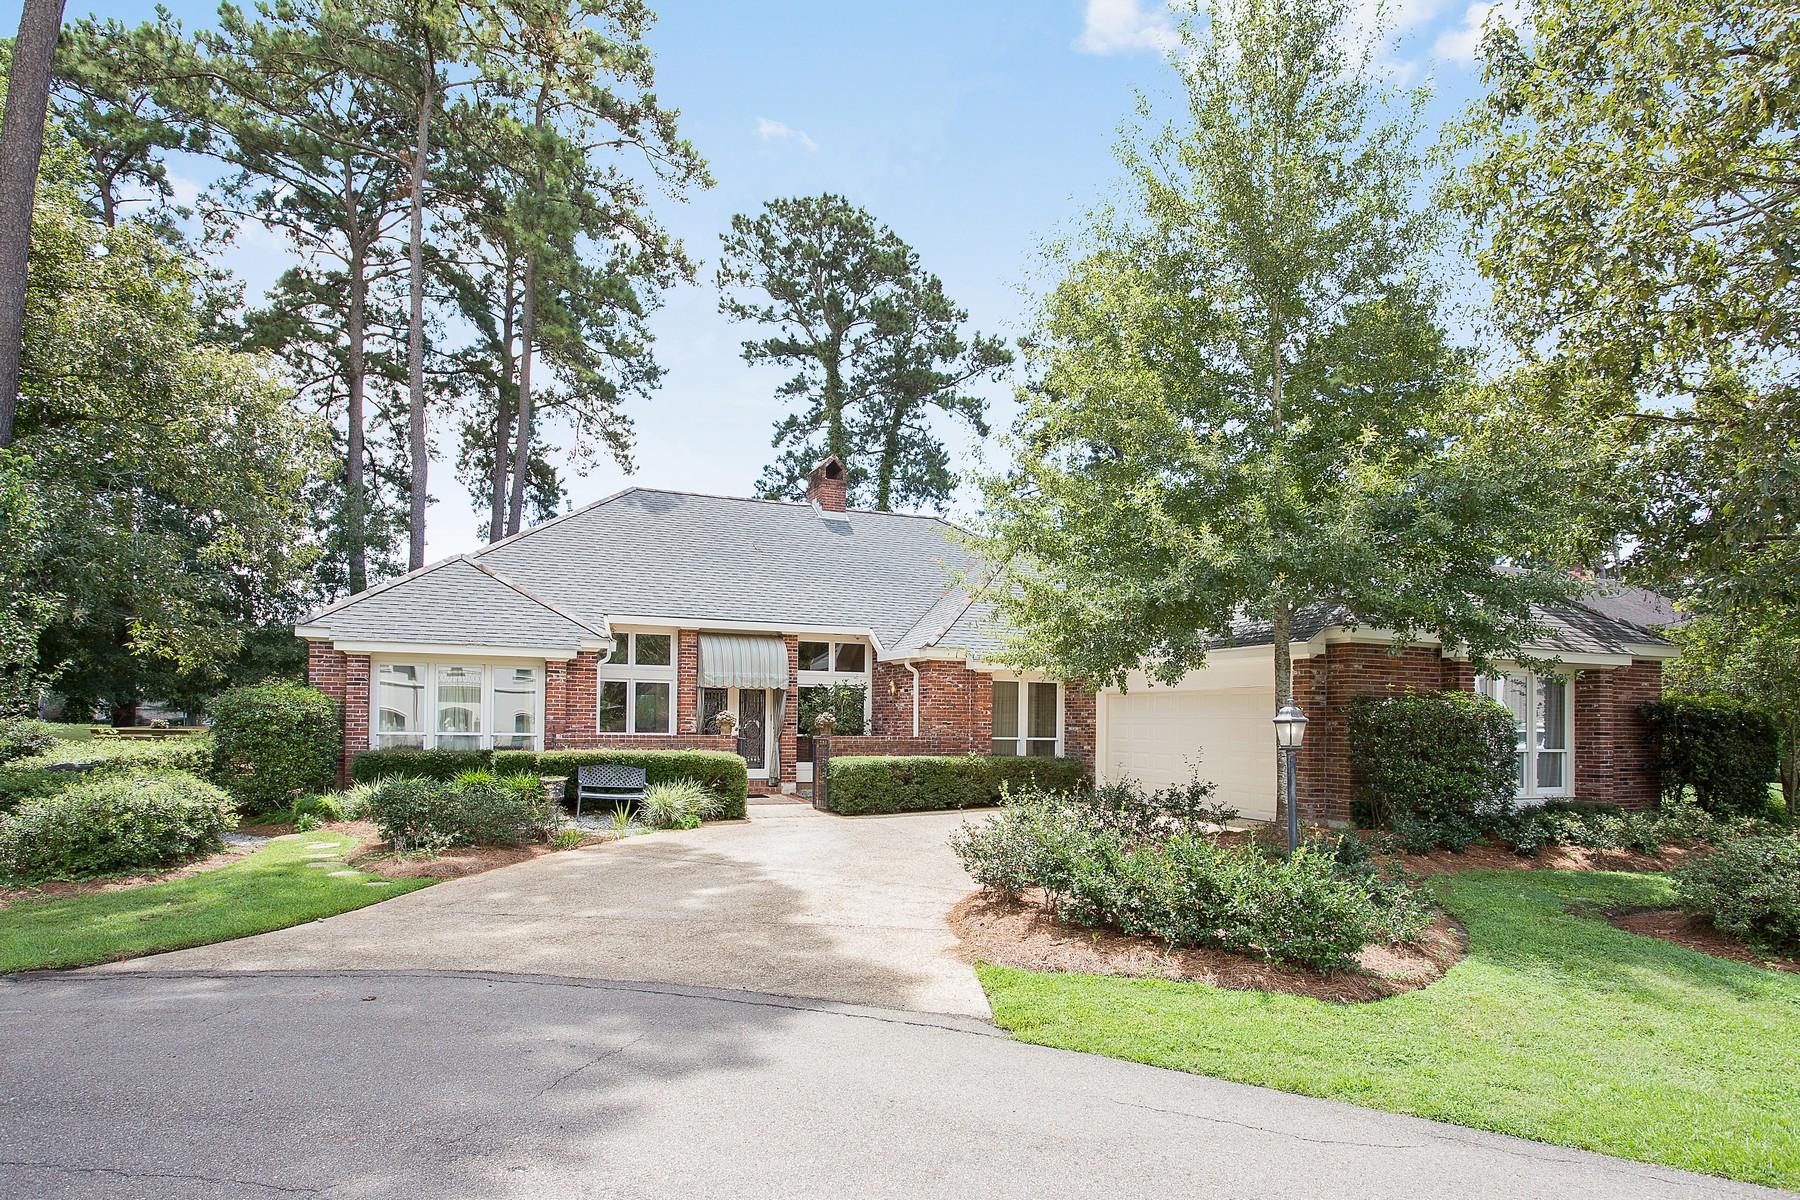 Single Family Home for Sale at 108 Audubon Lane, Mandeville 108 Audubon Ln Mandeville, Louisiana, 70471 United States